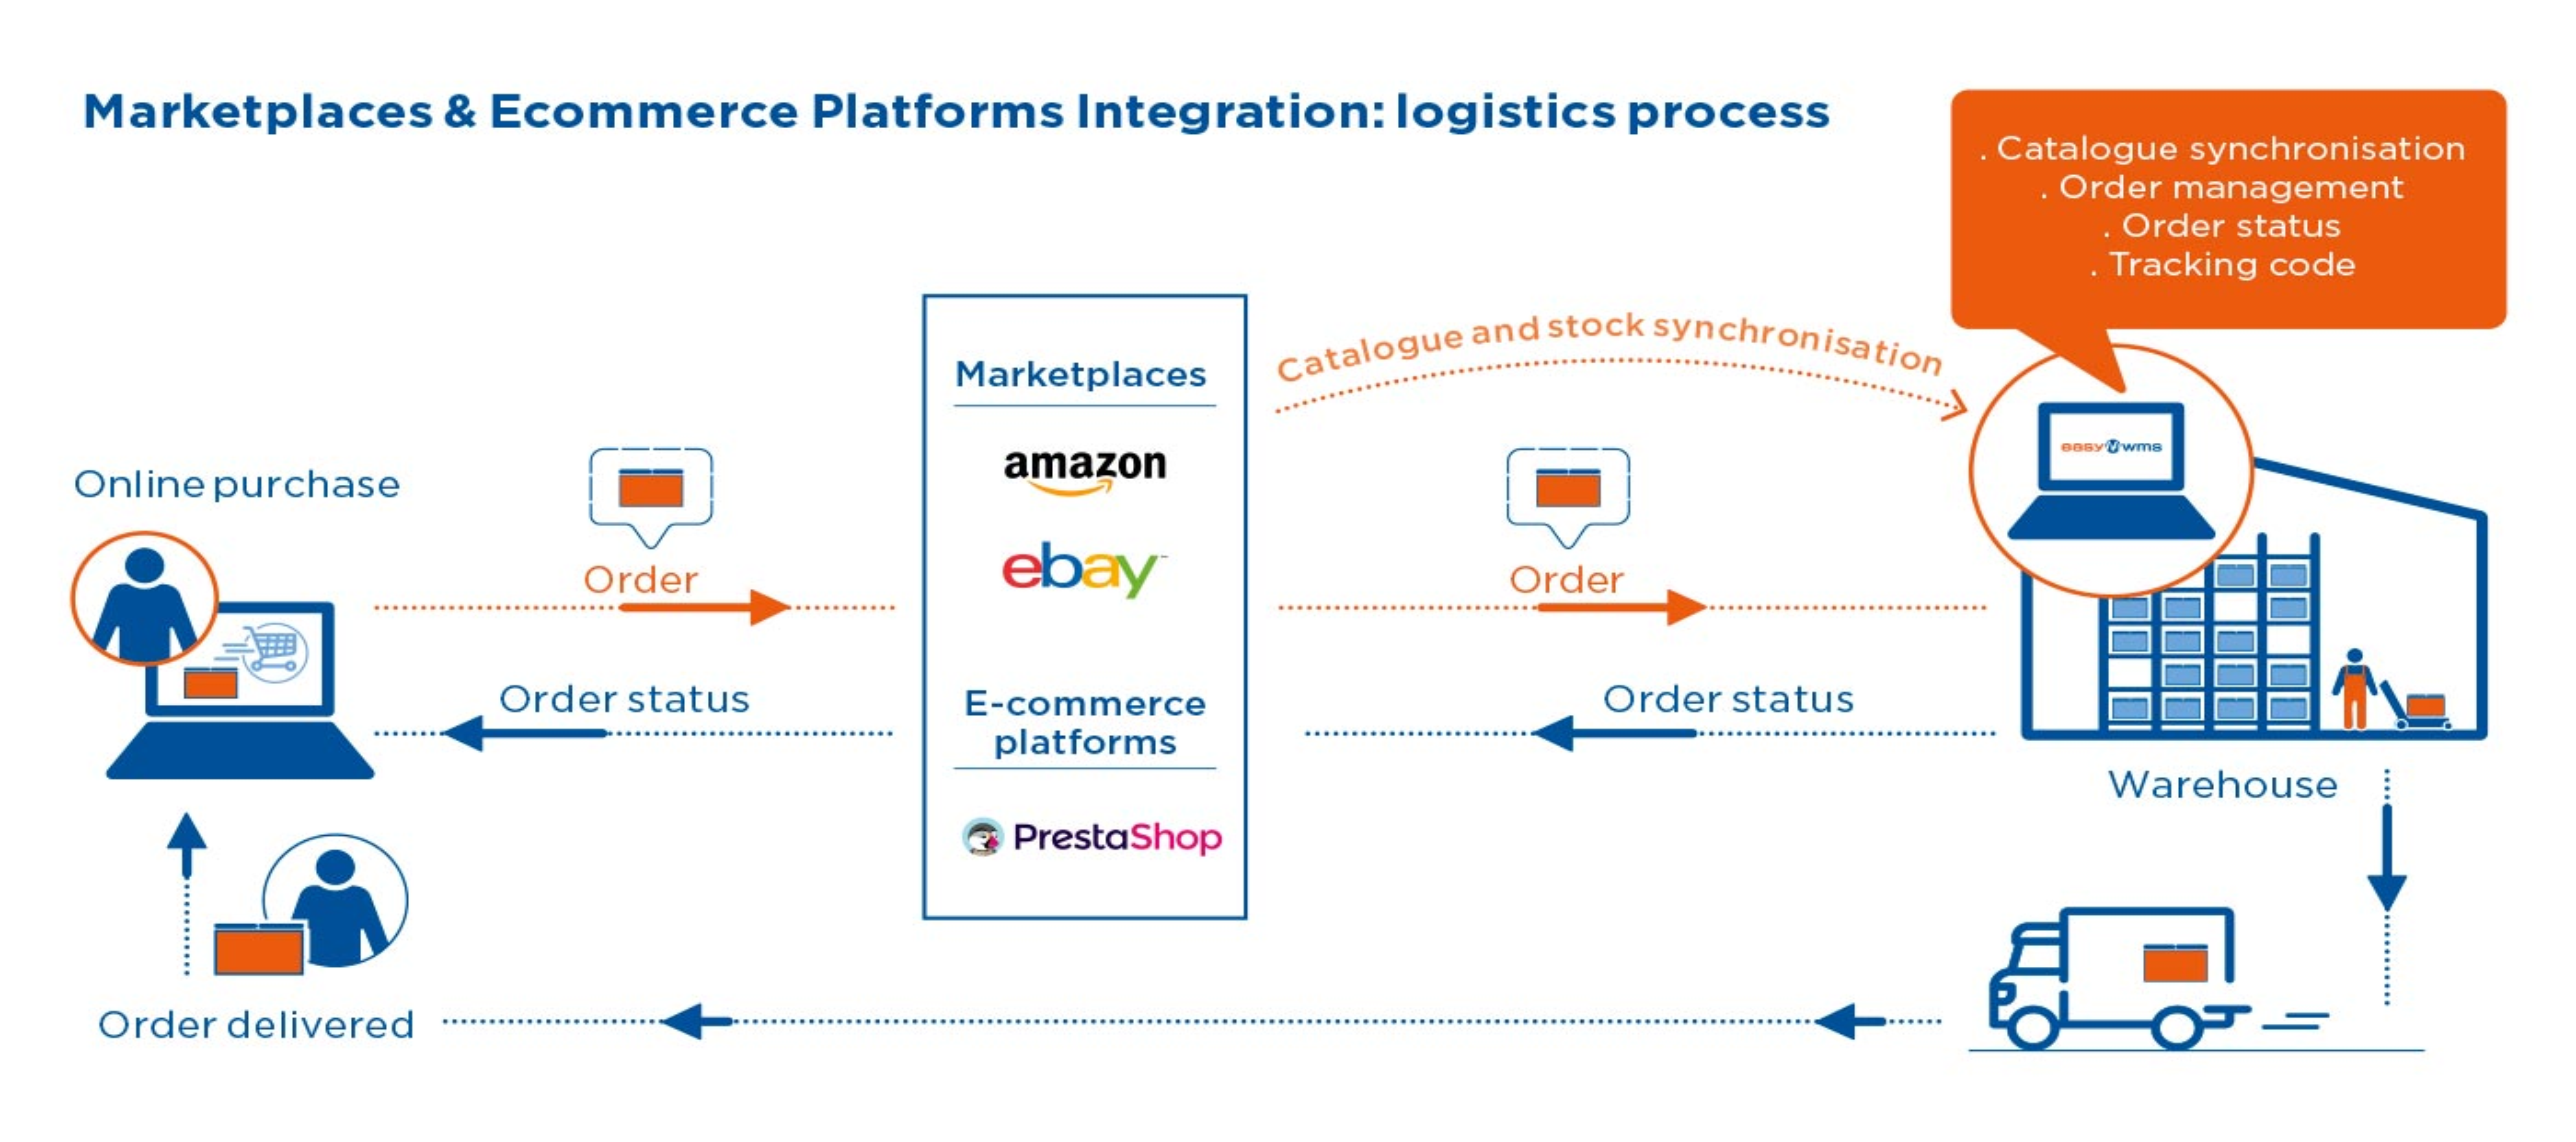 Marketplaces & Ecommerce Platforms integration: logistics process